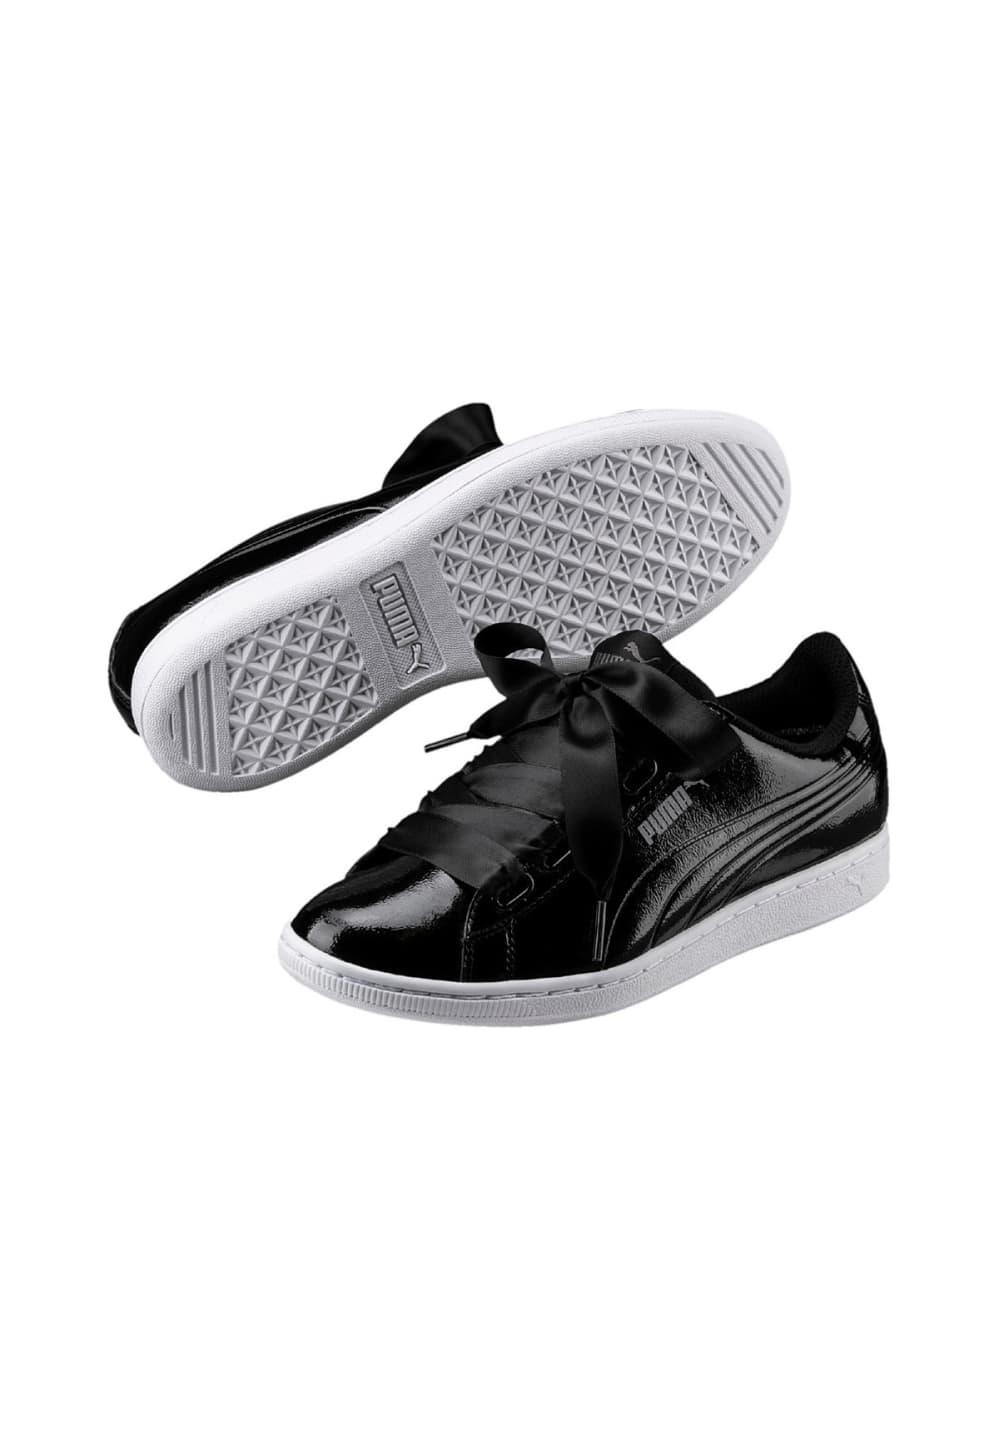 5076e157d9d502 ... Puma Vikky Ribbon P - Sneaker for Women - Black. Back to Overview. -60%